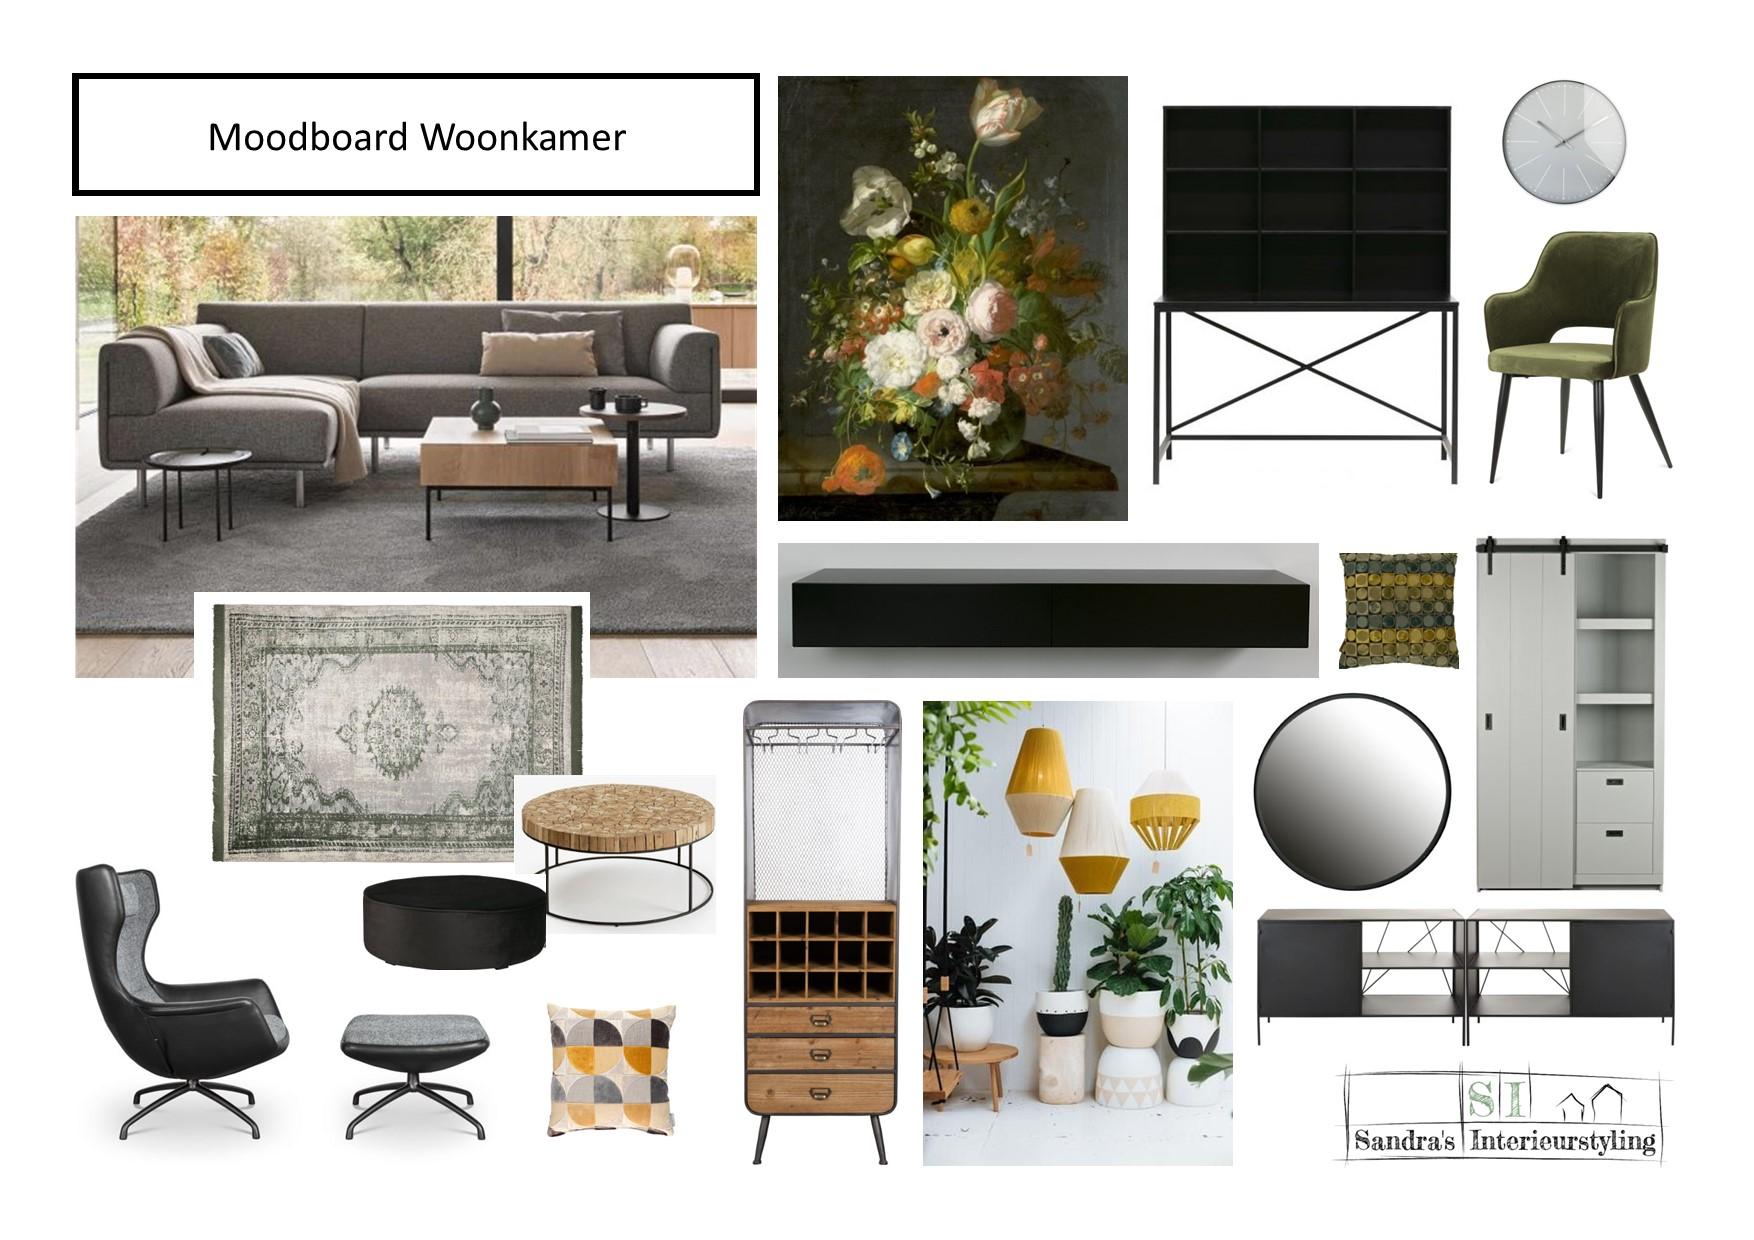 Moodboard woonkamer